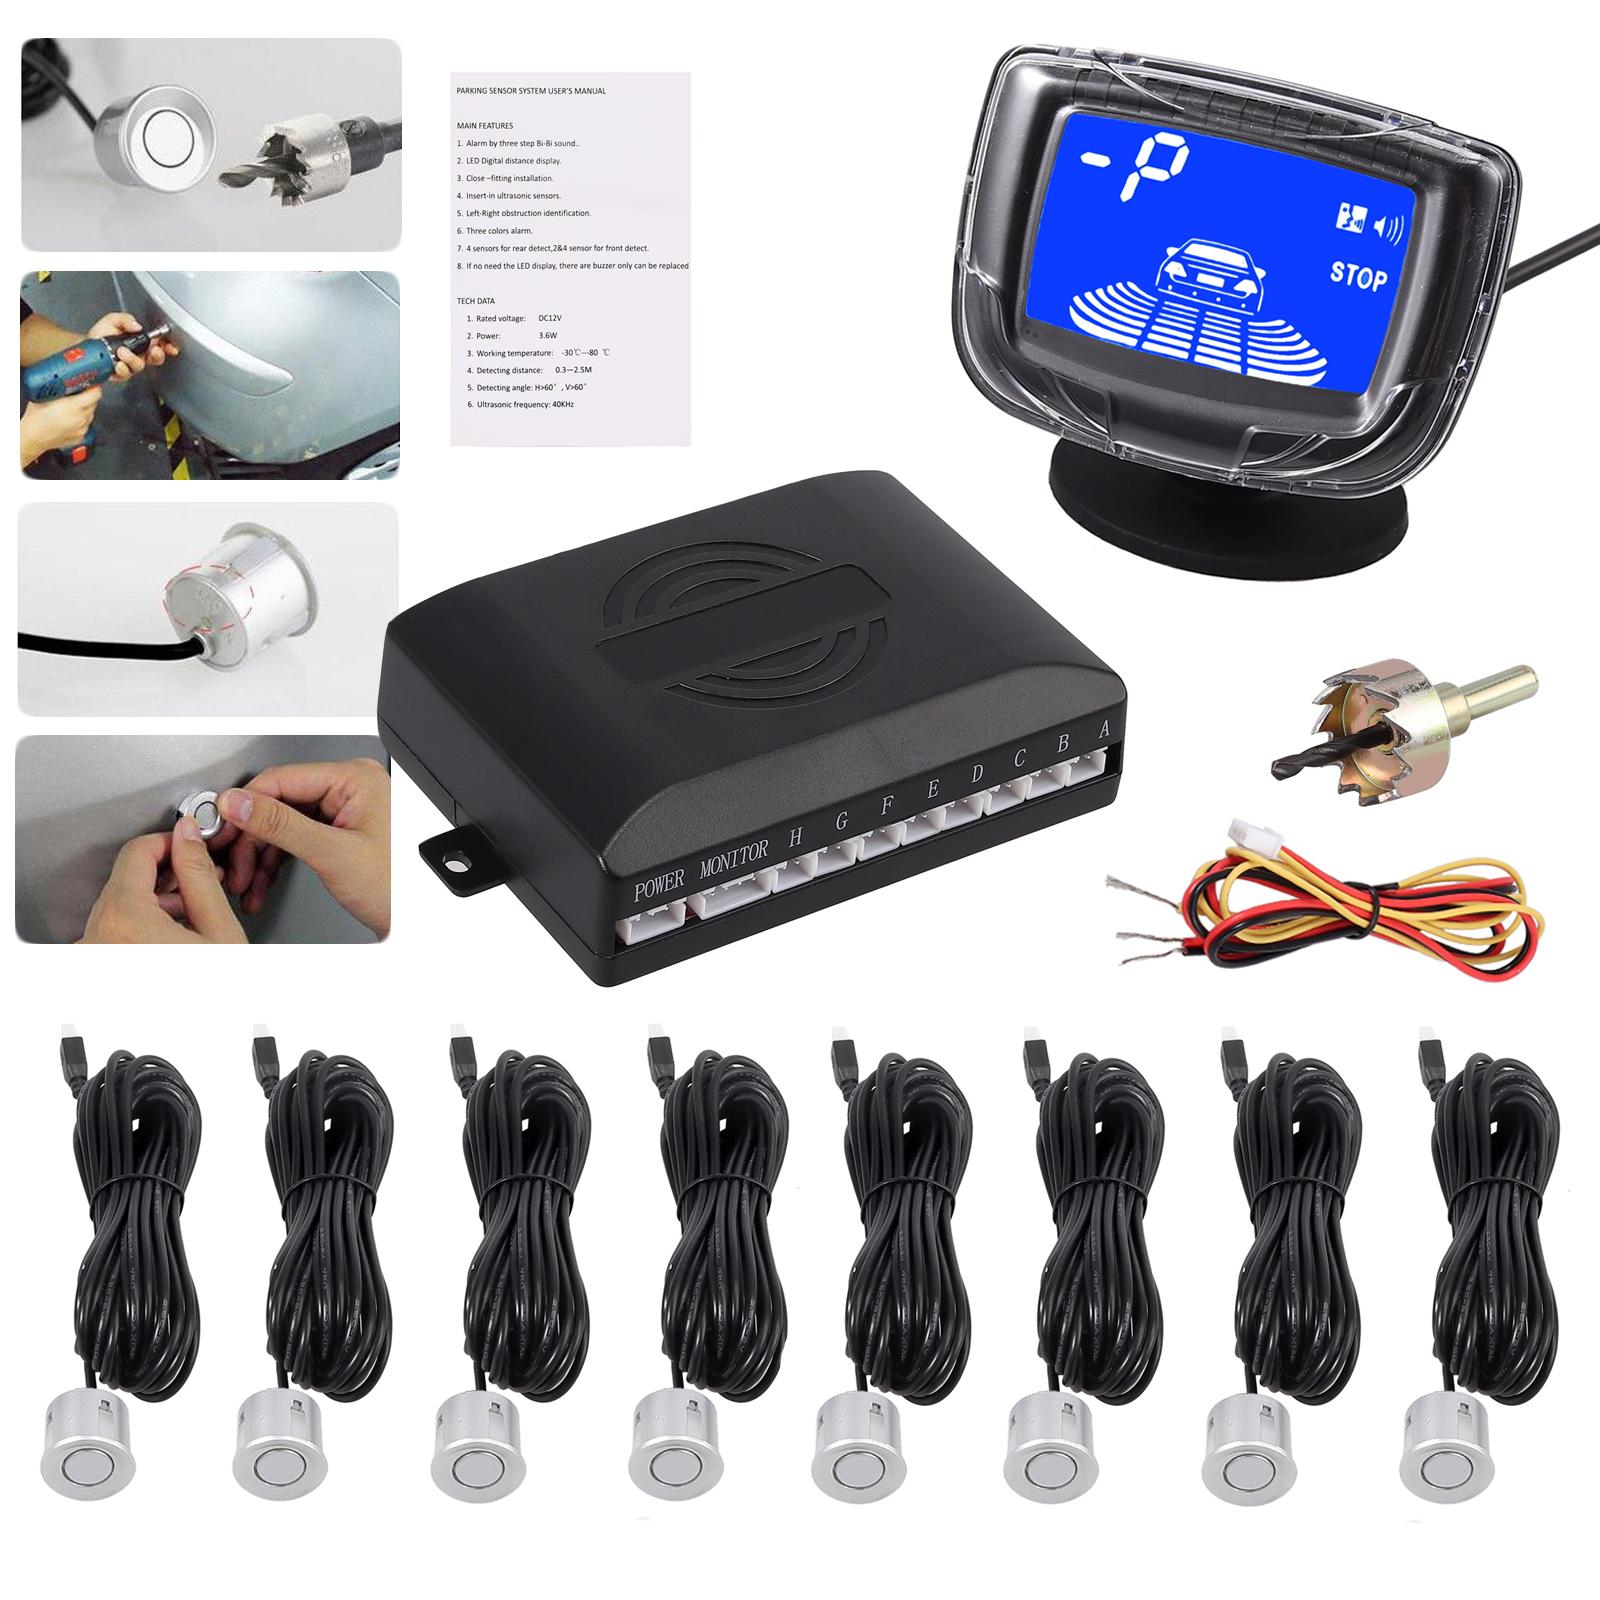 Black 6 Rear Parking Reversing Sensors with LED Display 2 Front 4 Rear